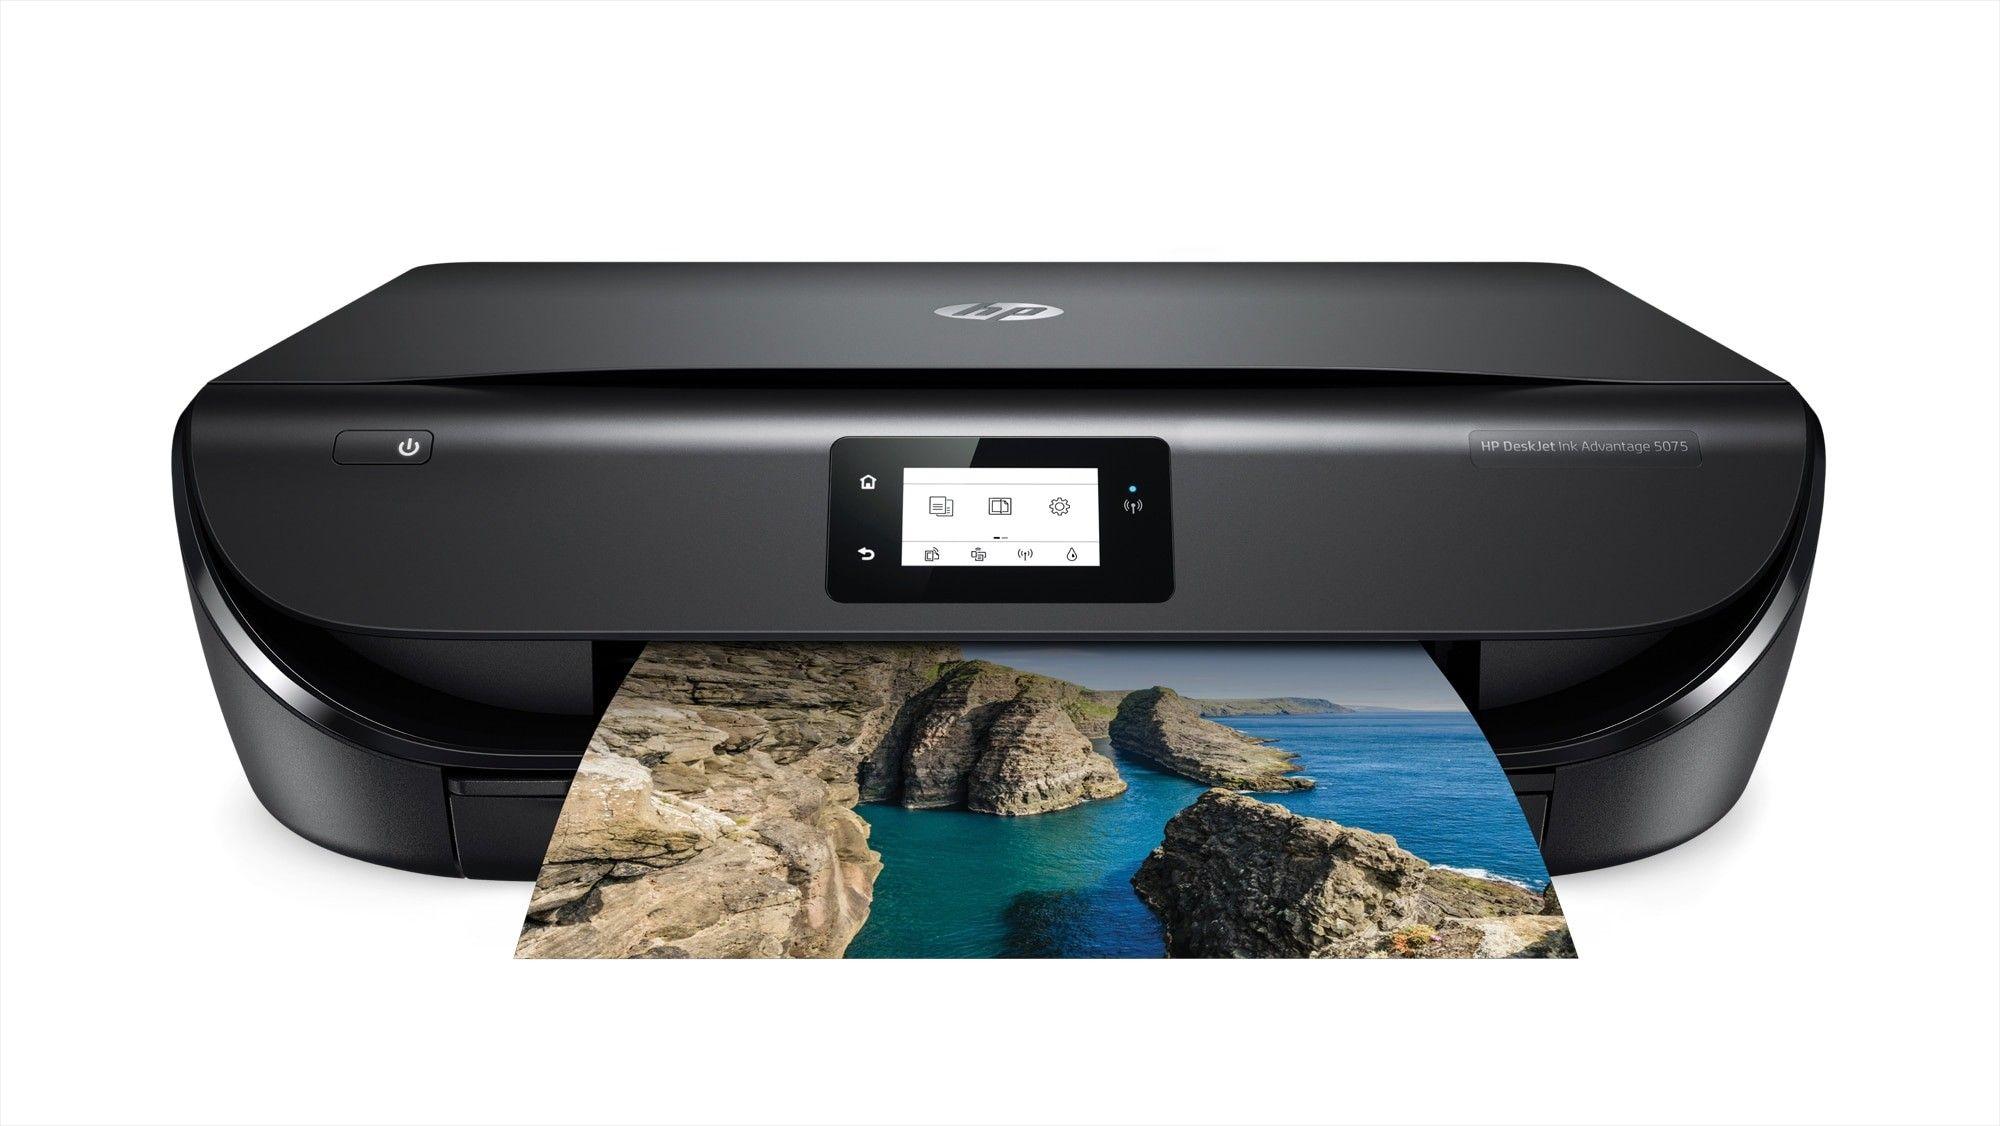 Hp Deskjet 5075 Inkjet 10 Ppm 4800 X 1200 Dpi A4 Wi Fi In Stock At Best Buy Cyprus For 110 00 Wireless Printer Hp Instant Ink Printer